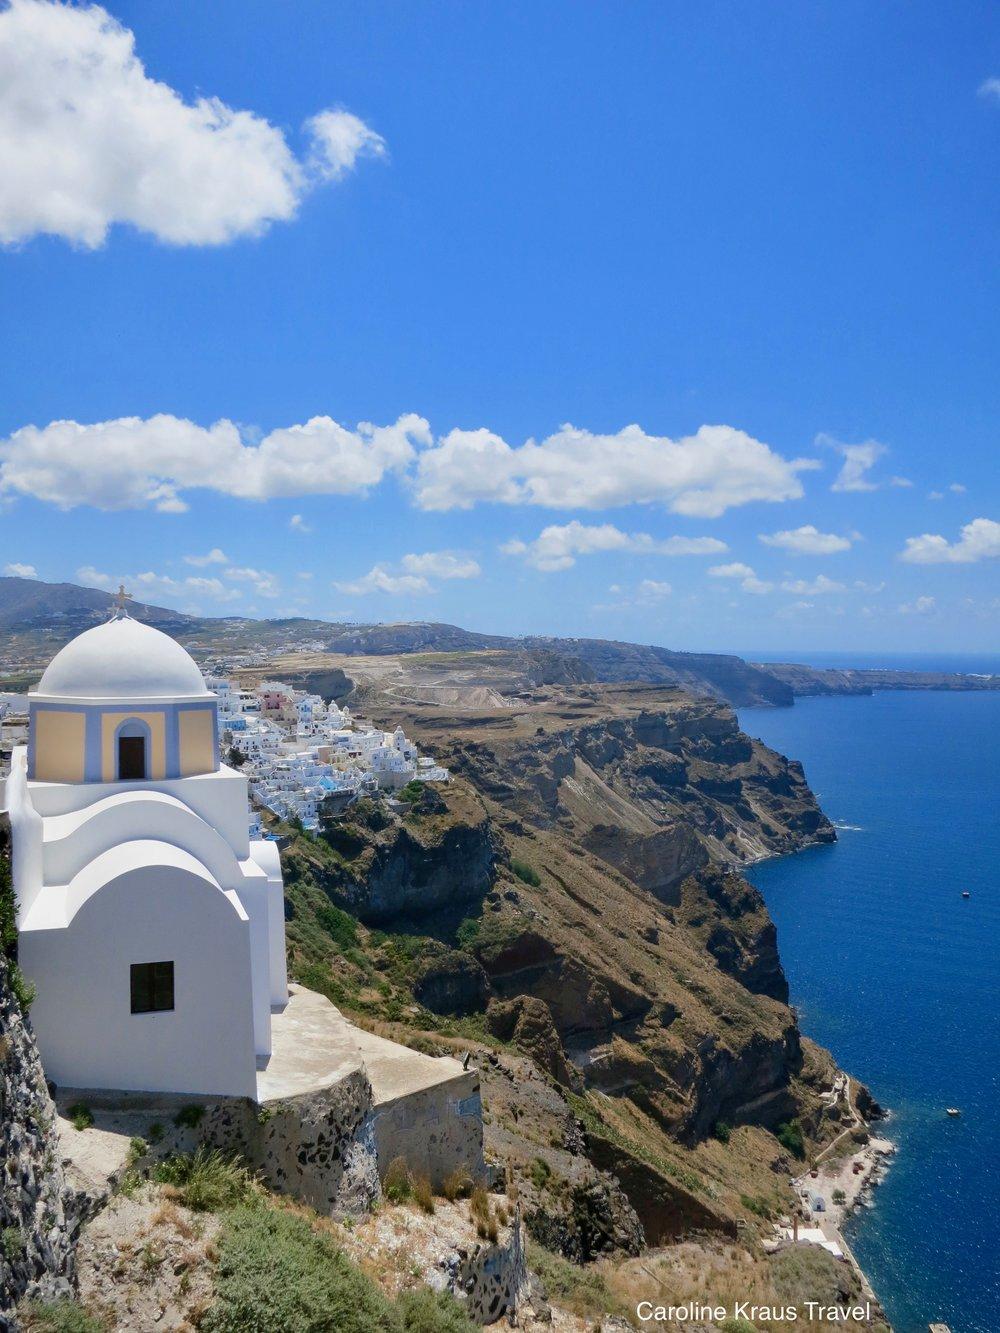 Imerovigli, a village on the island of Santorini